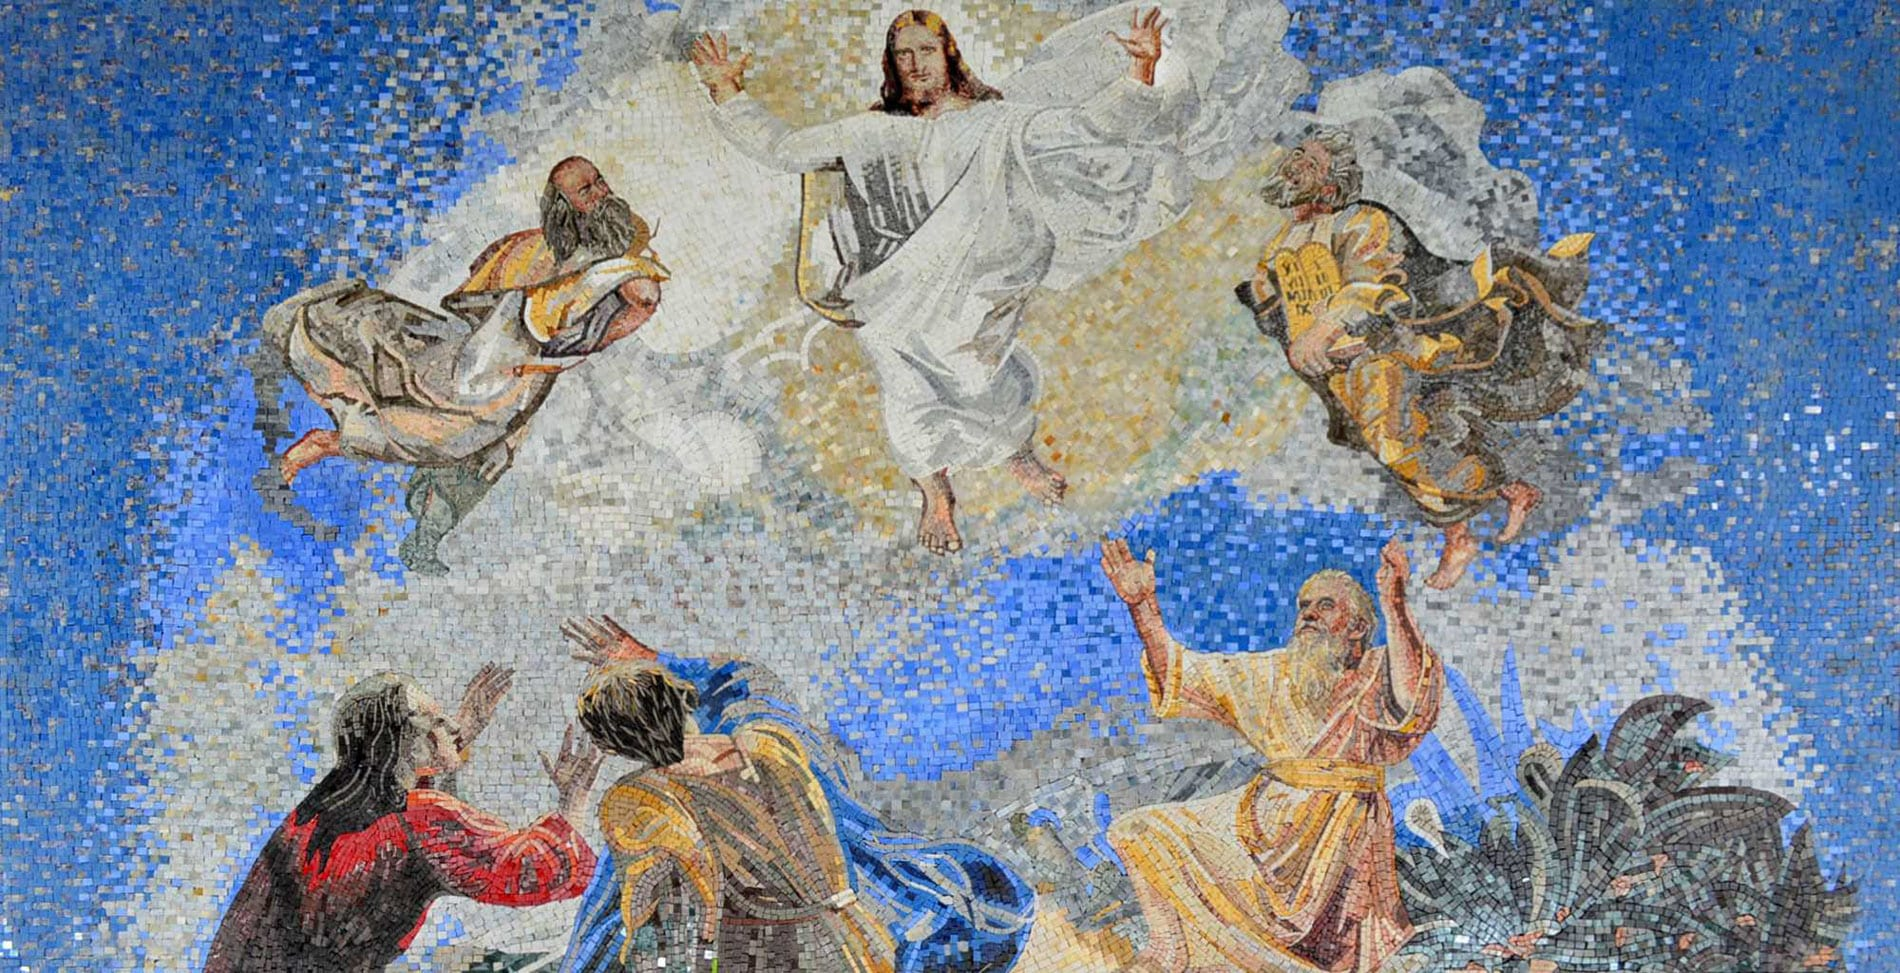 Second Vatican Council (Vatican II) - Dei Verbum (The Dogmatic Constitution on Divine Revelation of Vatican II)